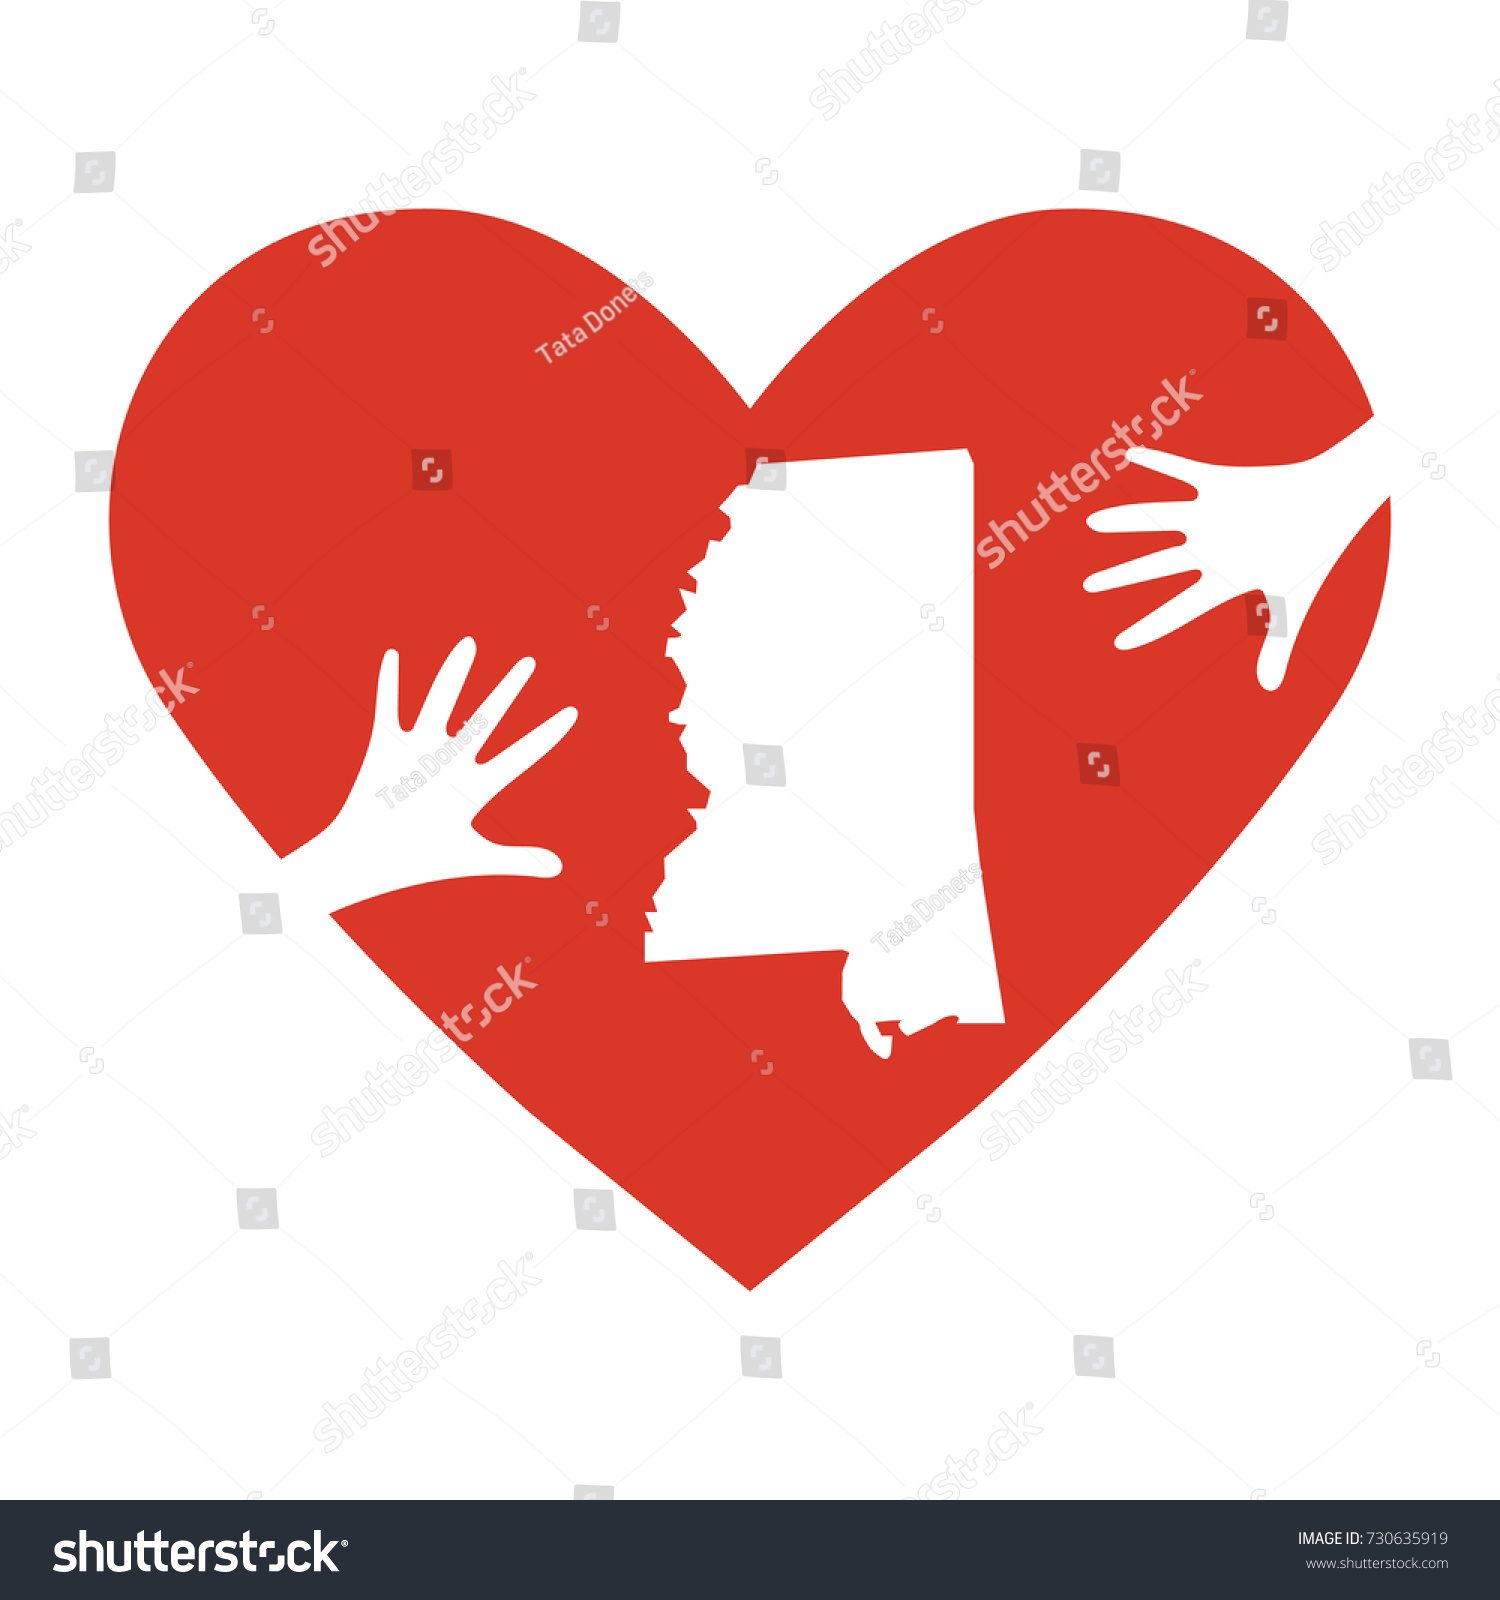 Vector illustration helping hands heart mississippi stock vector vector illustration helping hands heart mississippi map support for volunteer charity buycottarizona Gallery